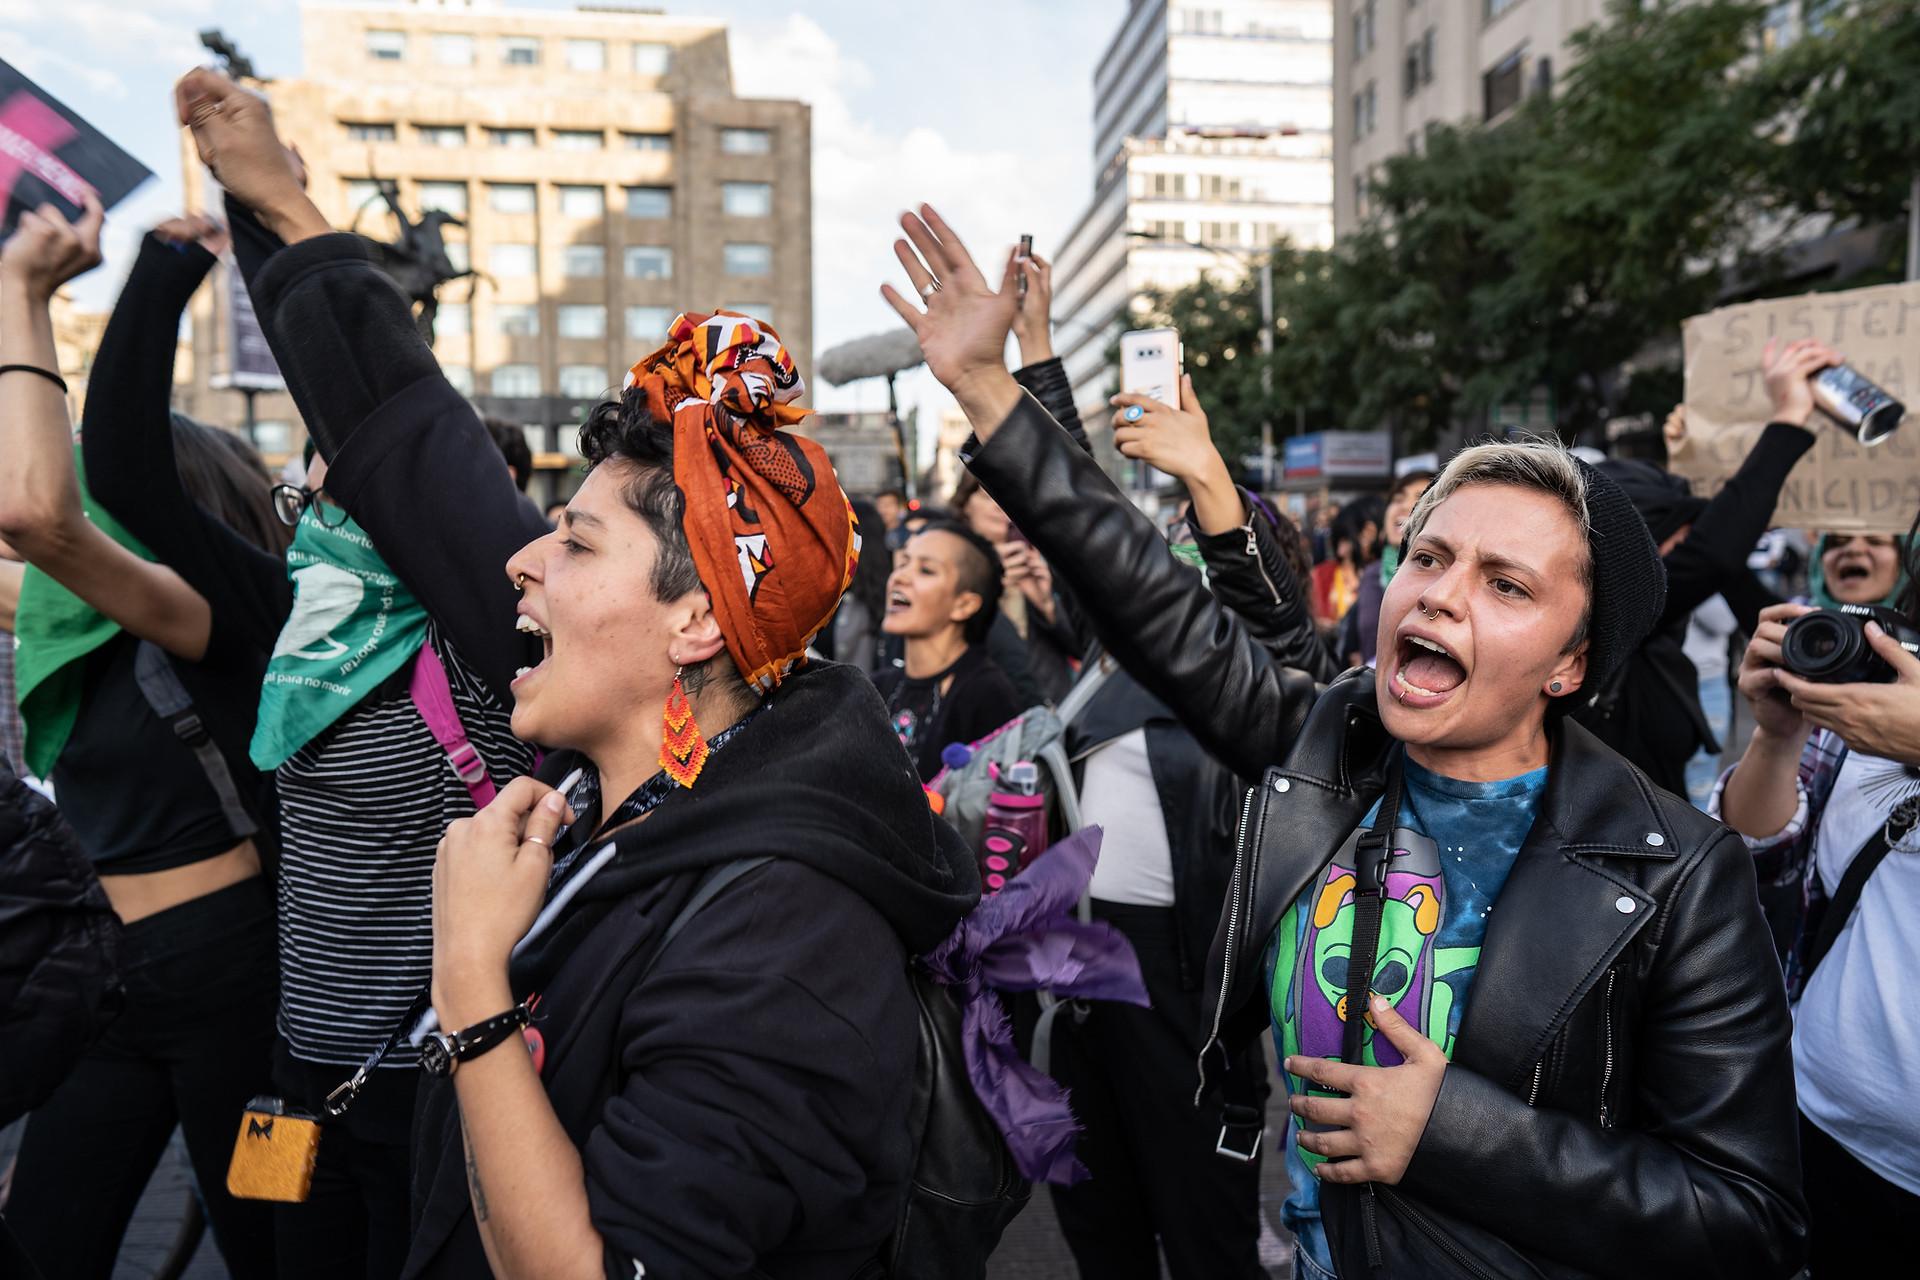 Feminist chanting